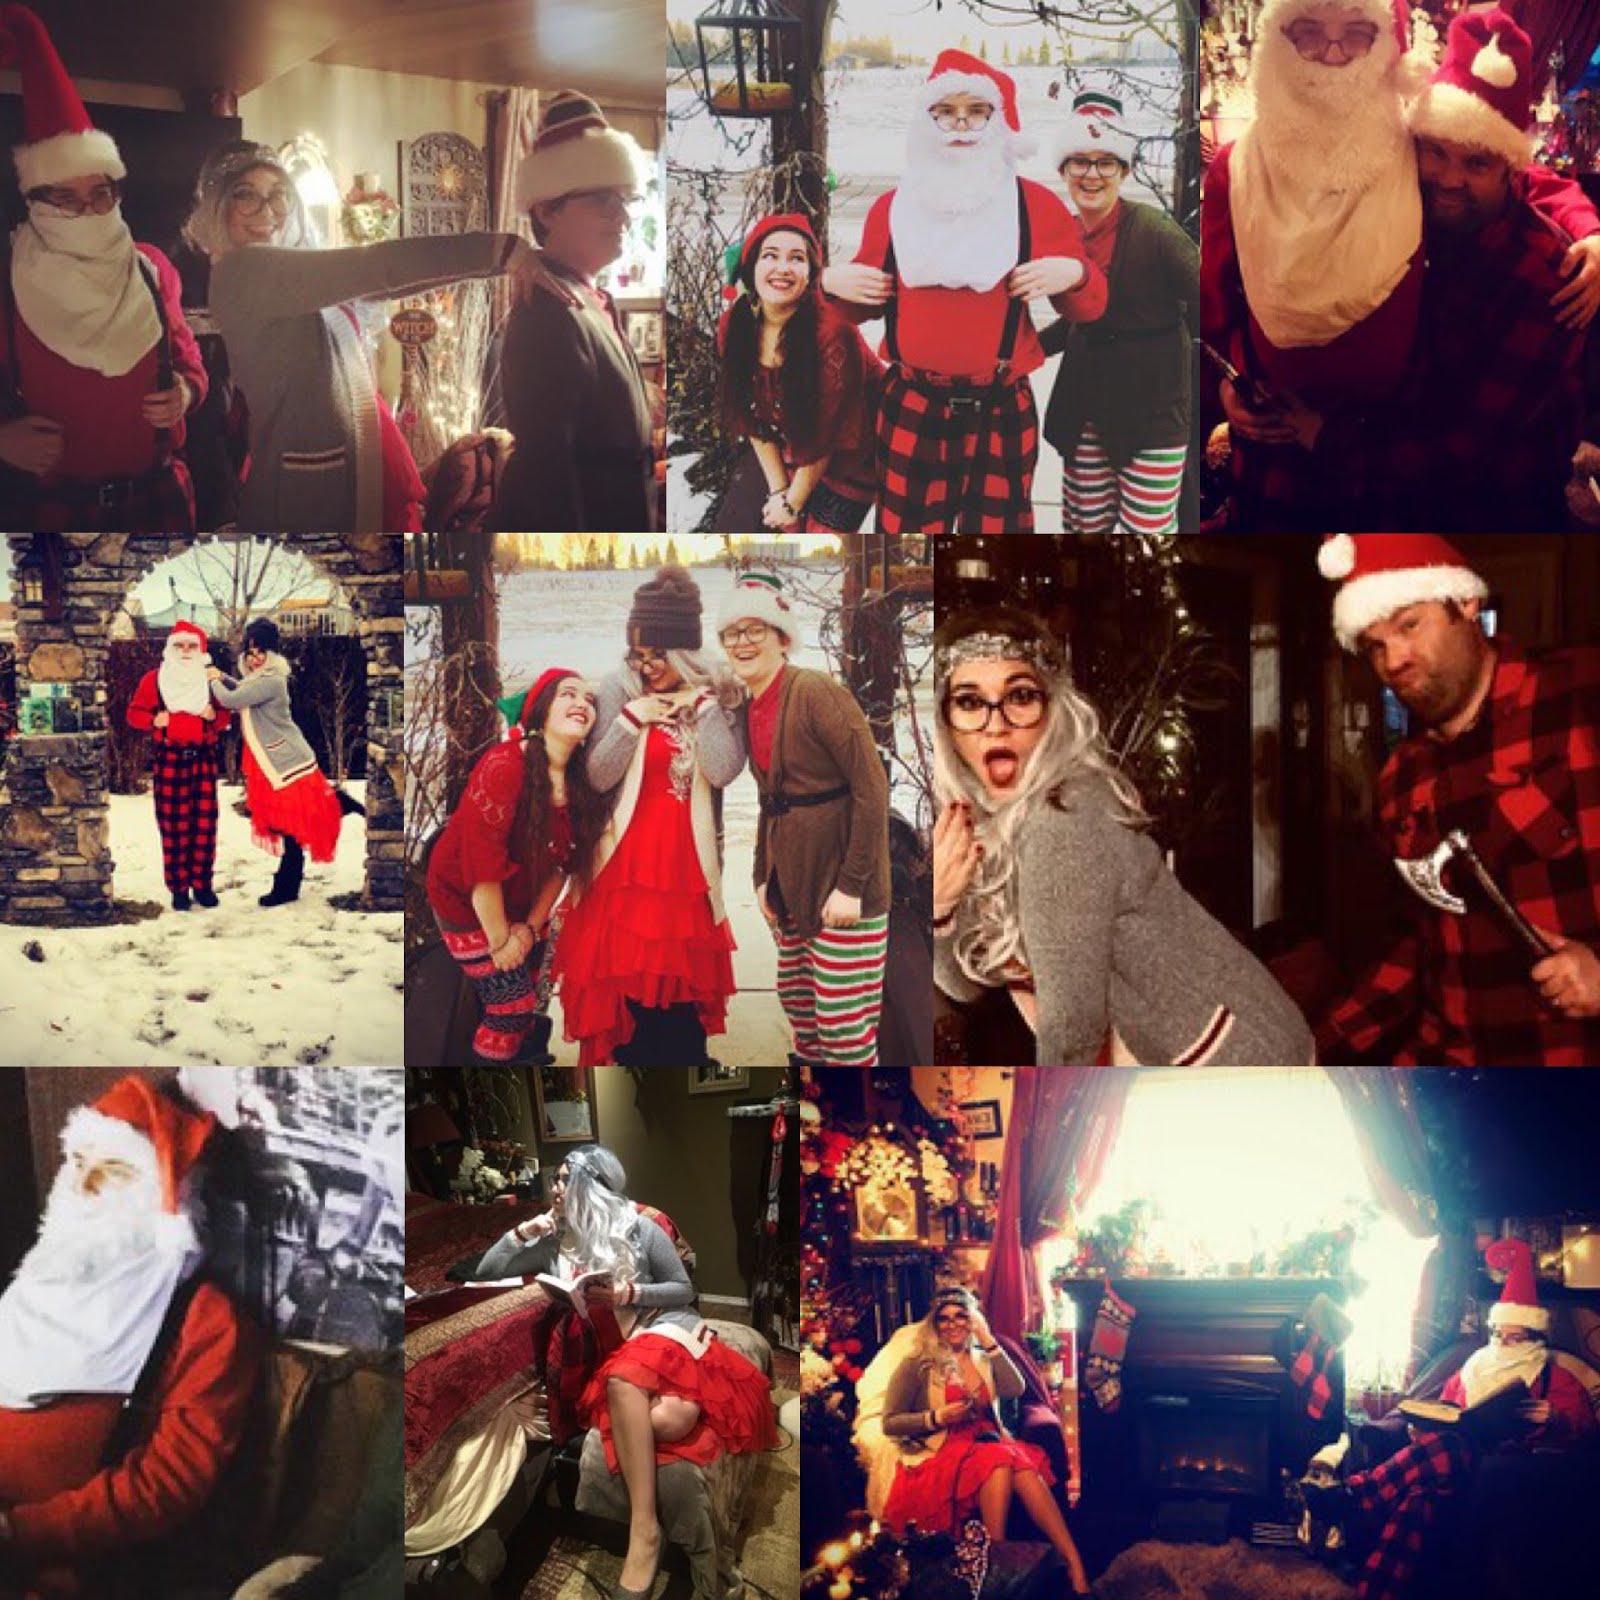 You Make Every Day Feel Like Christmas